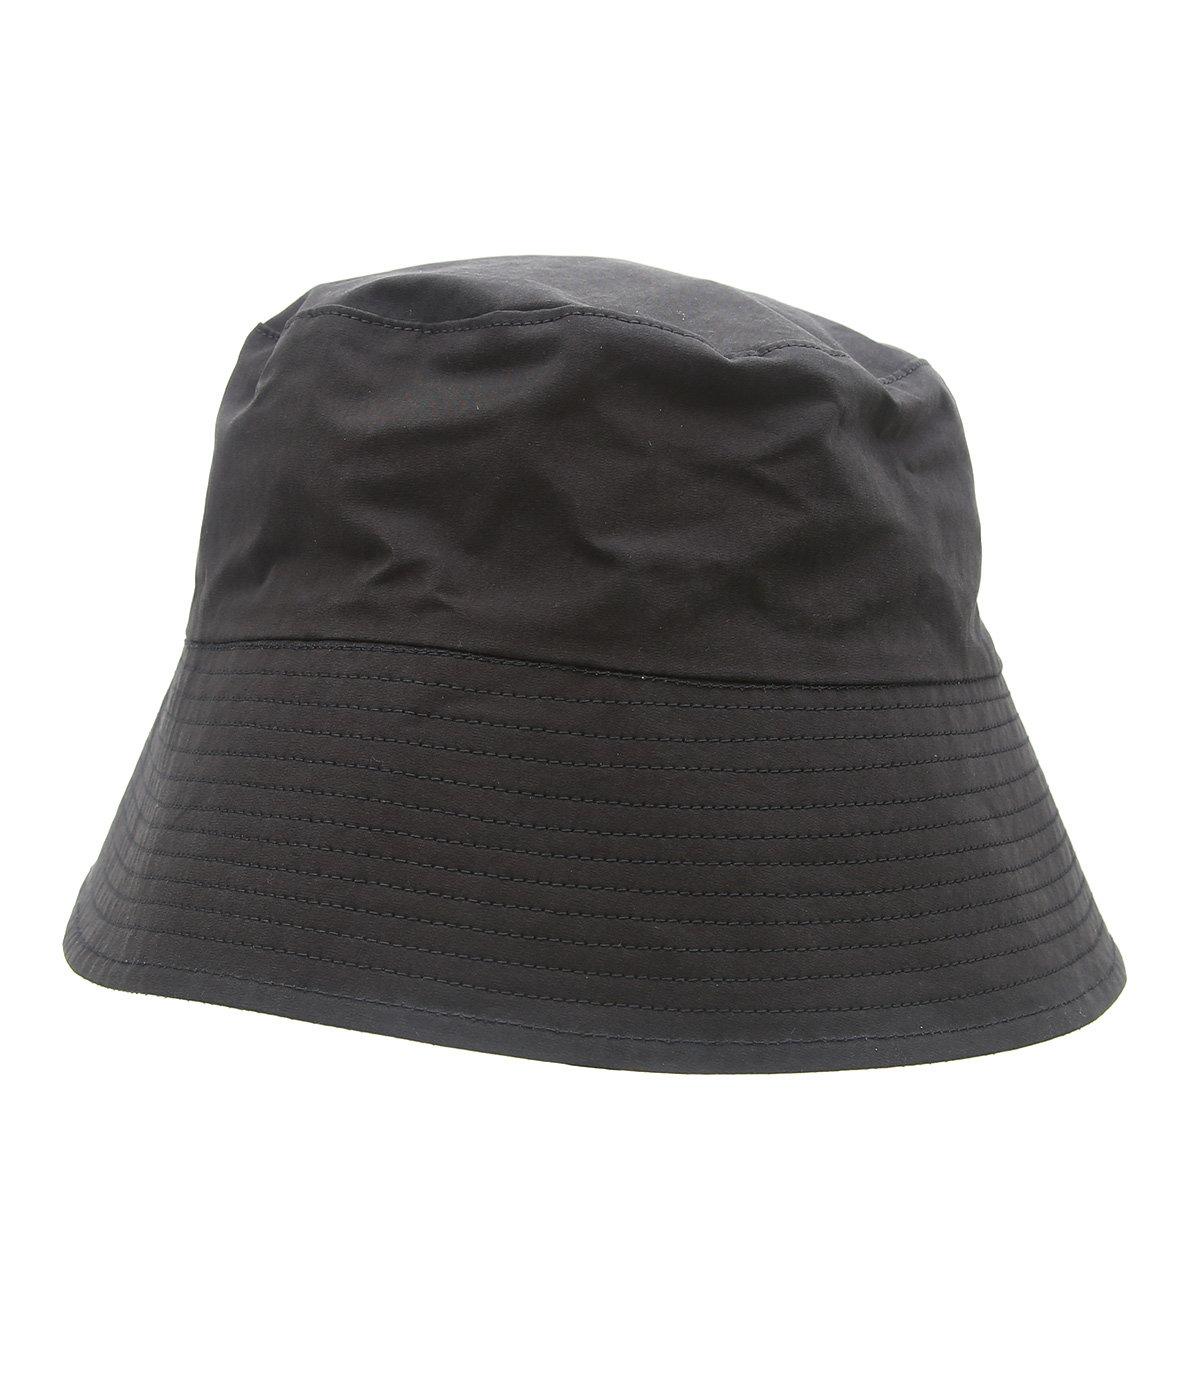 WATER PROOF HAT